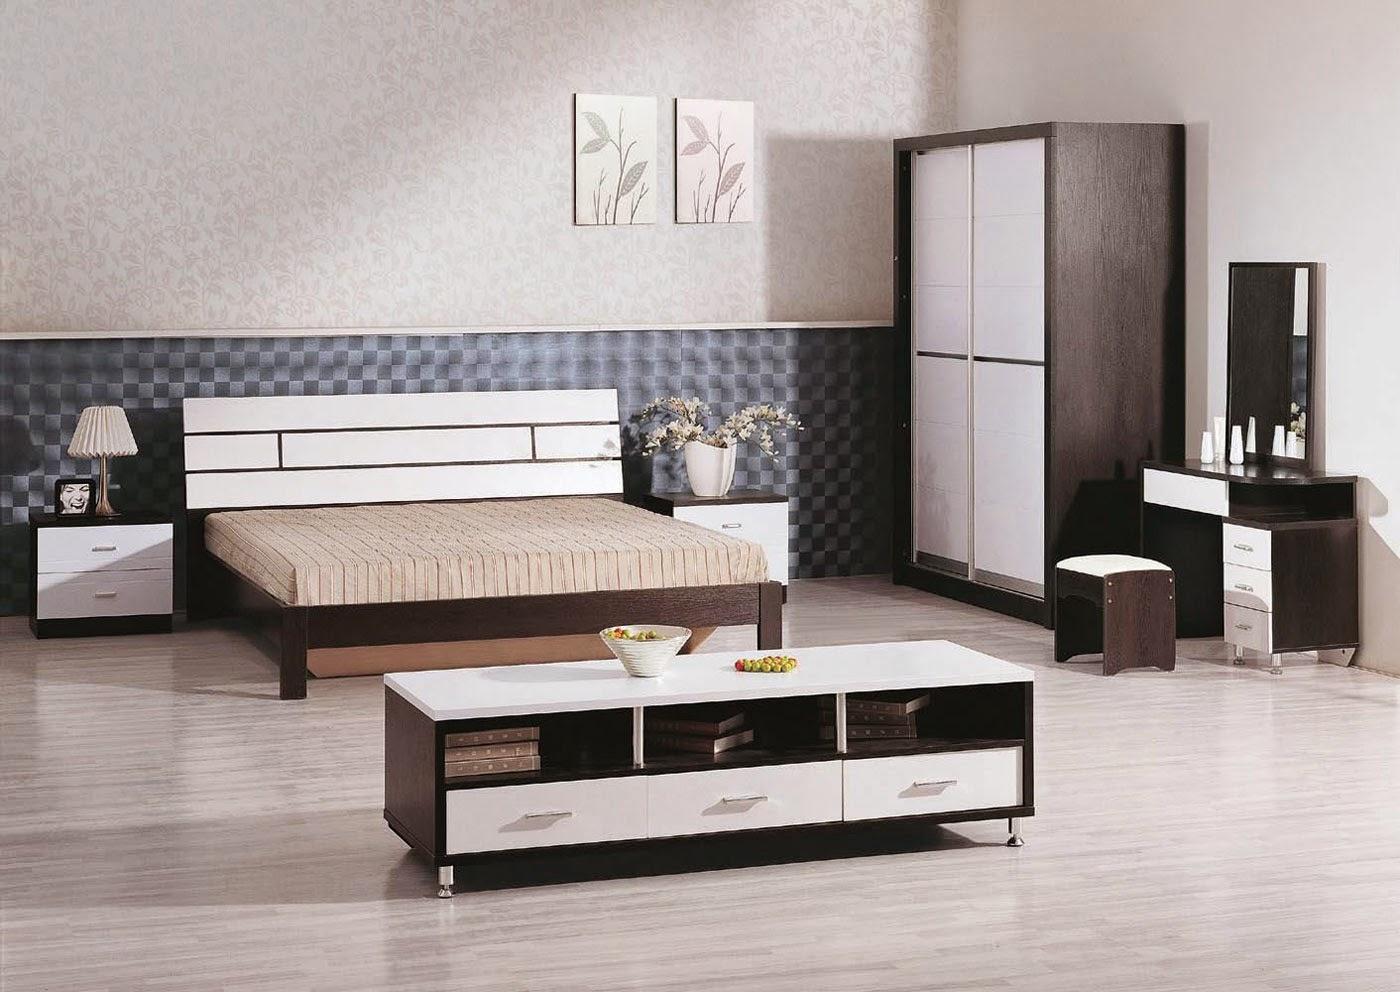 Picture-Wardrobe-Clothes-Minimalist-Home-For-Minimalist